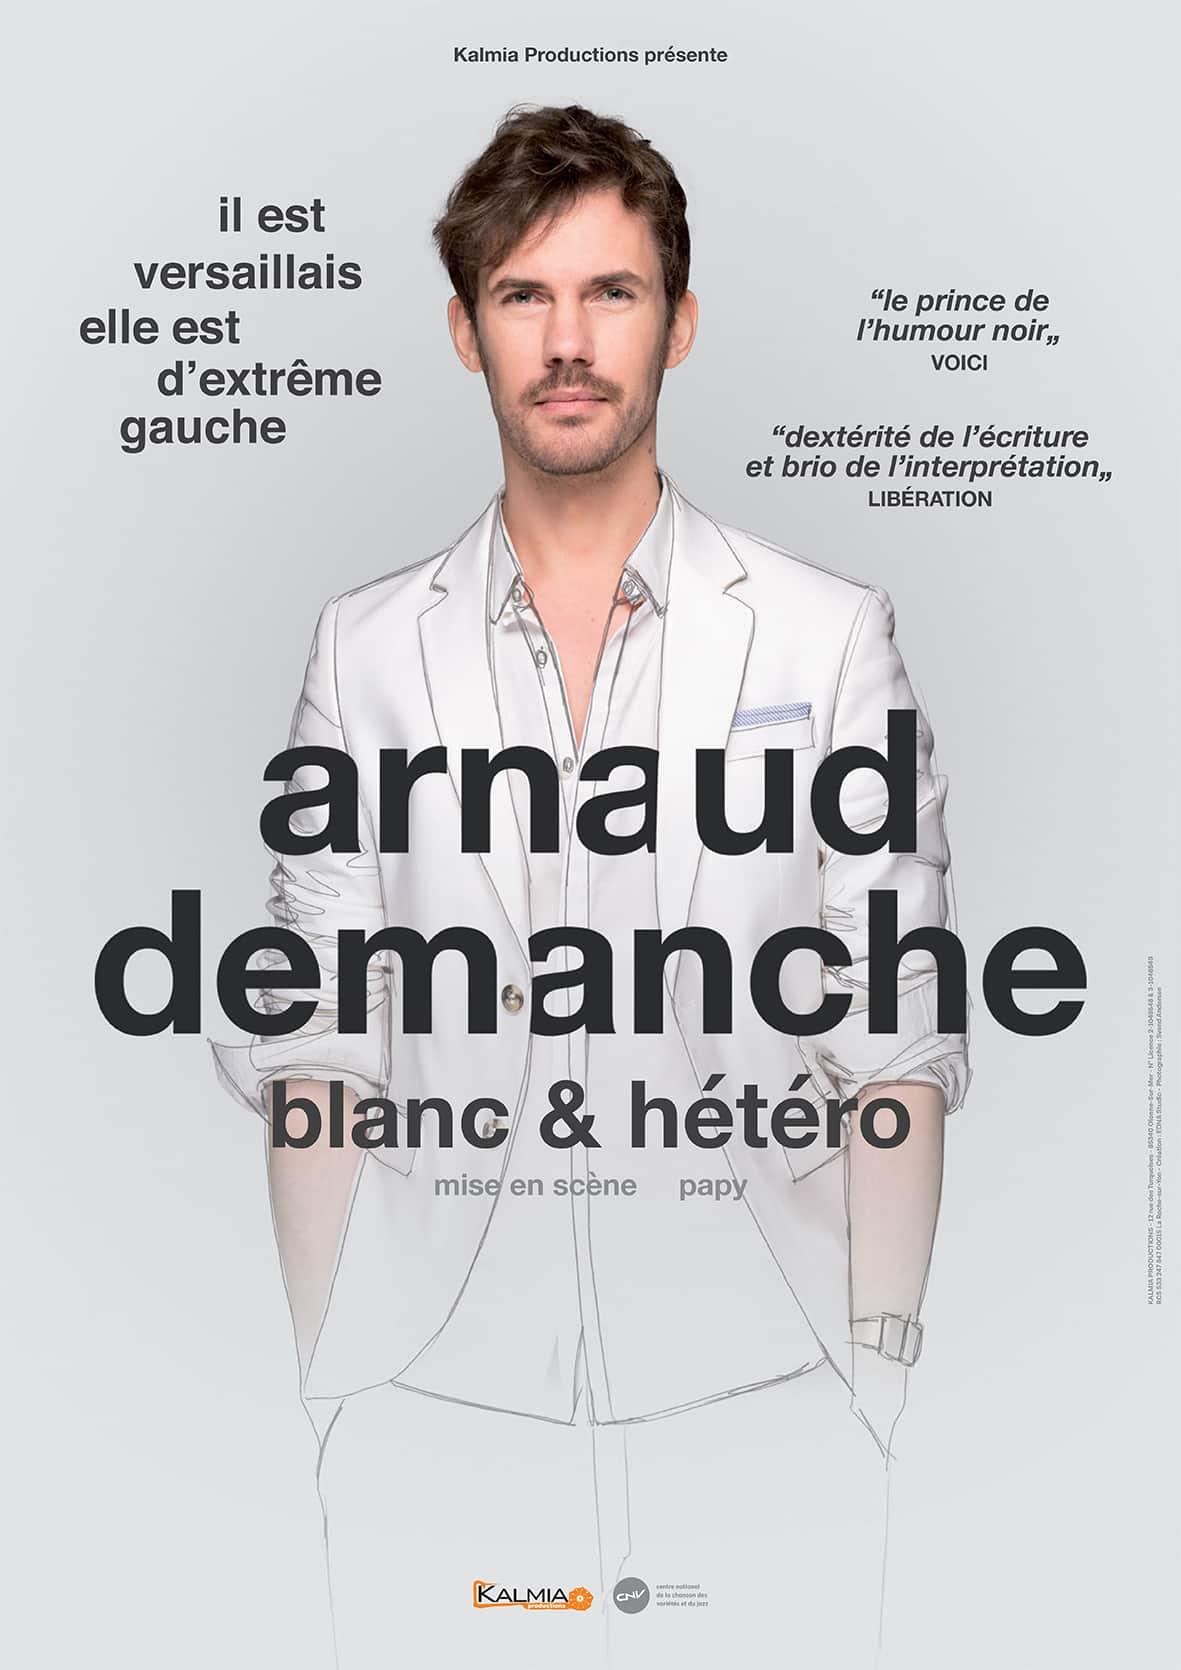 Arnaud Demanche - L'Art Dû - Mrire Festival - Marseille - Humour - Stand Up